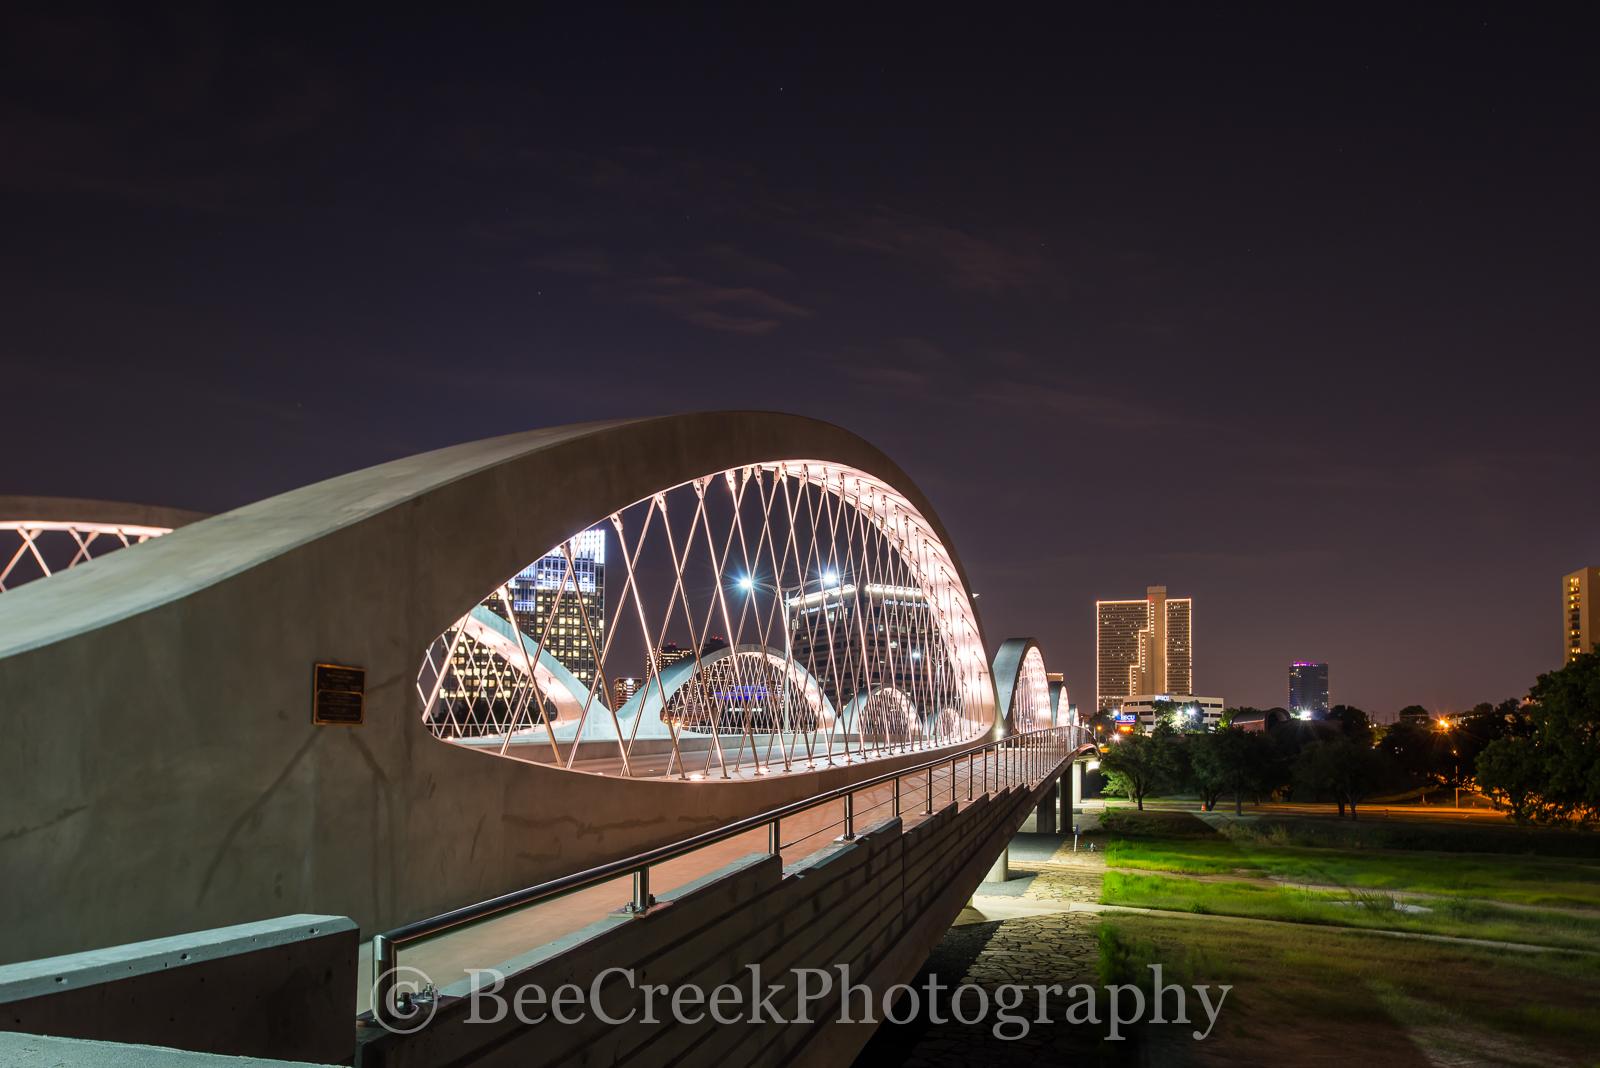 Fort Worth Tx, Fort Worth Bridge, Fort Worth Seventh Street Bridge, Ft Worth at night, Fort Worth cityscape, Fort Worth skyline, Trinity river, cityscapes, skyline, bidge, , photo